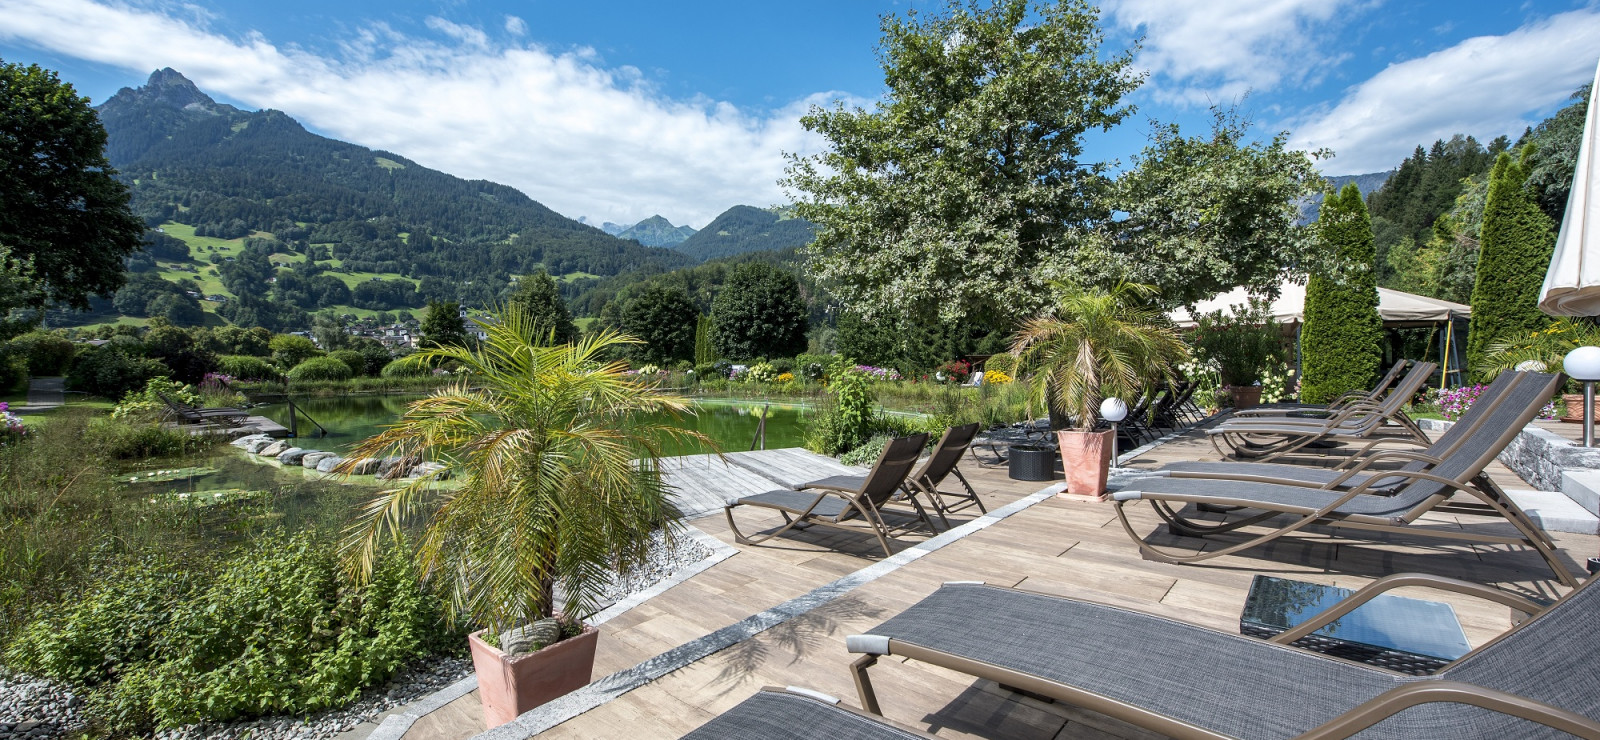 Hotel Vitalquelle Montafon Bilder | Bild 1